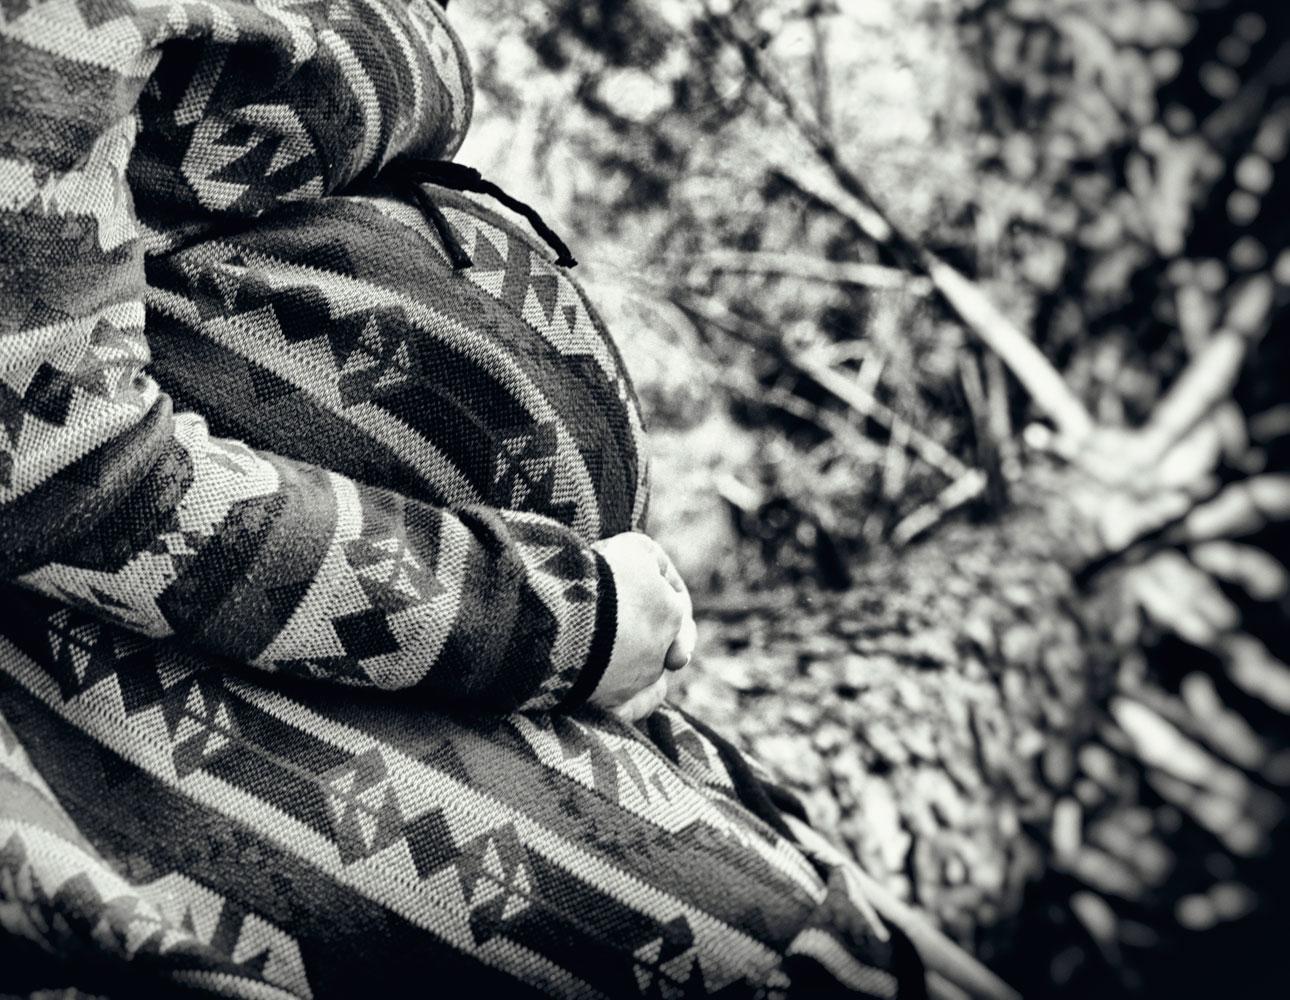 zwangerschapsfotoshoot marike bijlsma jeanique buik zwart-wit